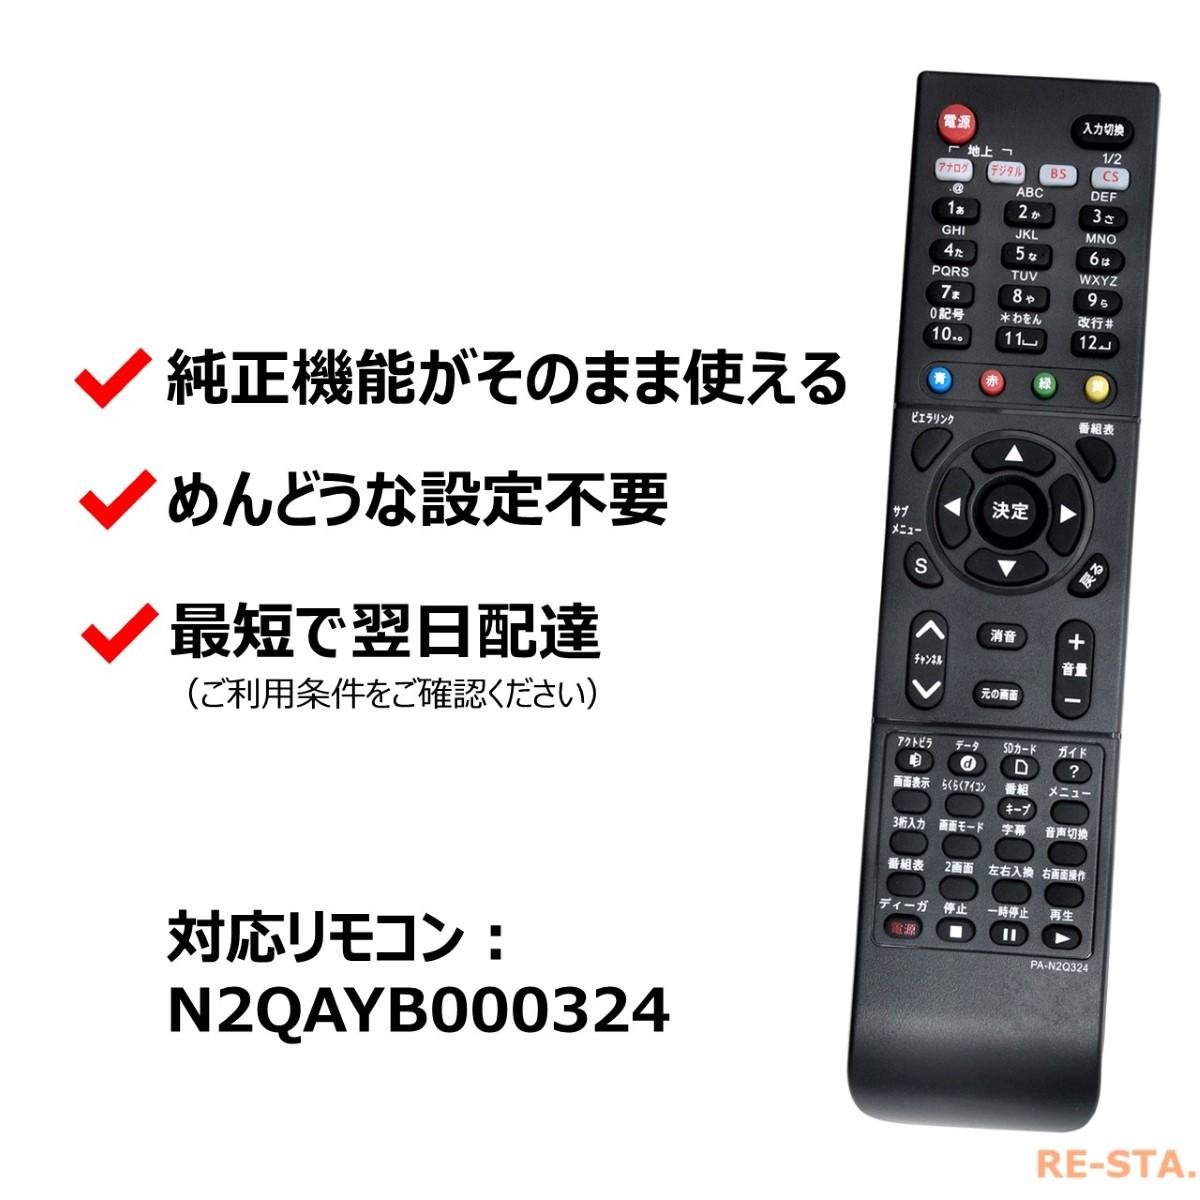 TH42PX63EH Panasonic Ersatzfernbedienung für TXL32X15PS TXL42E6Y